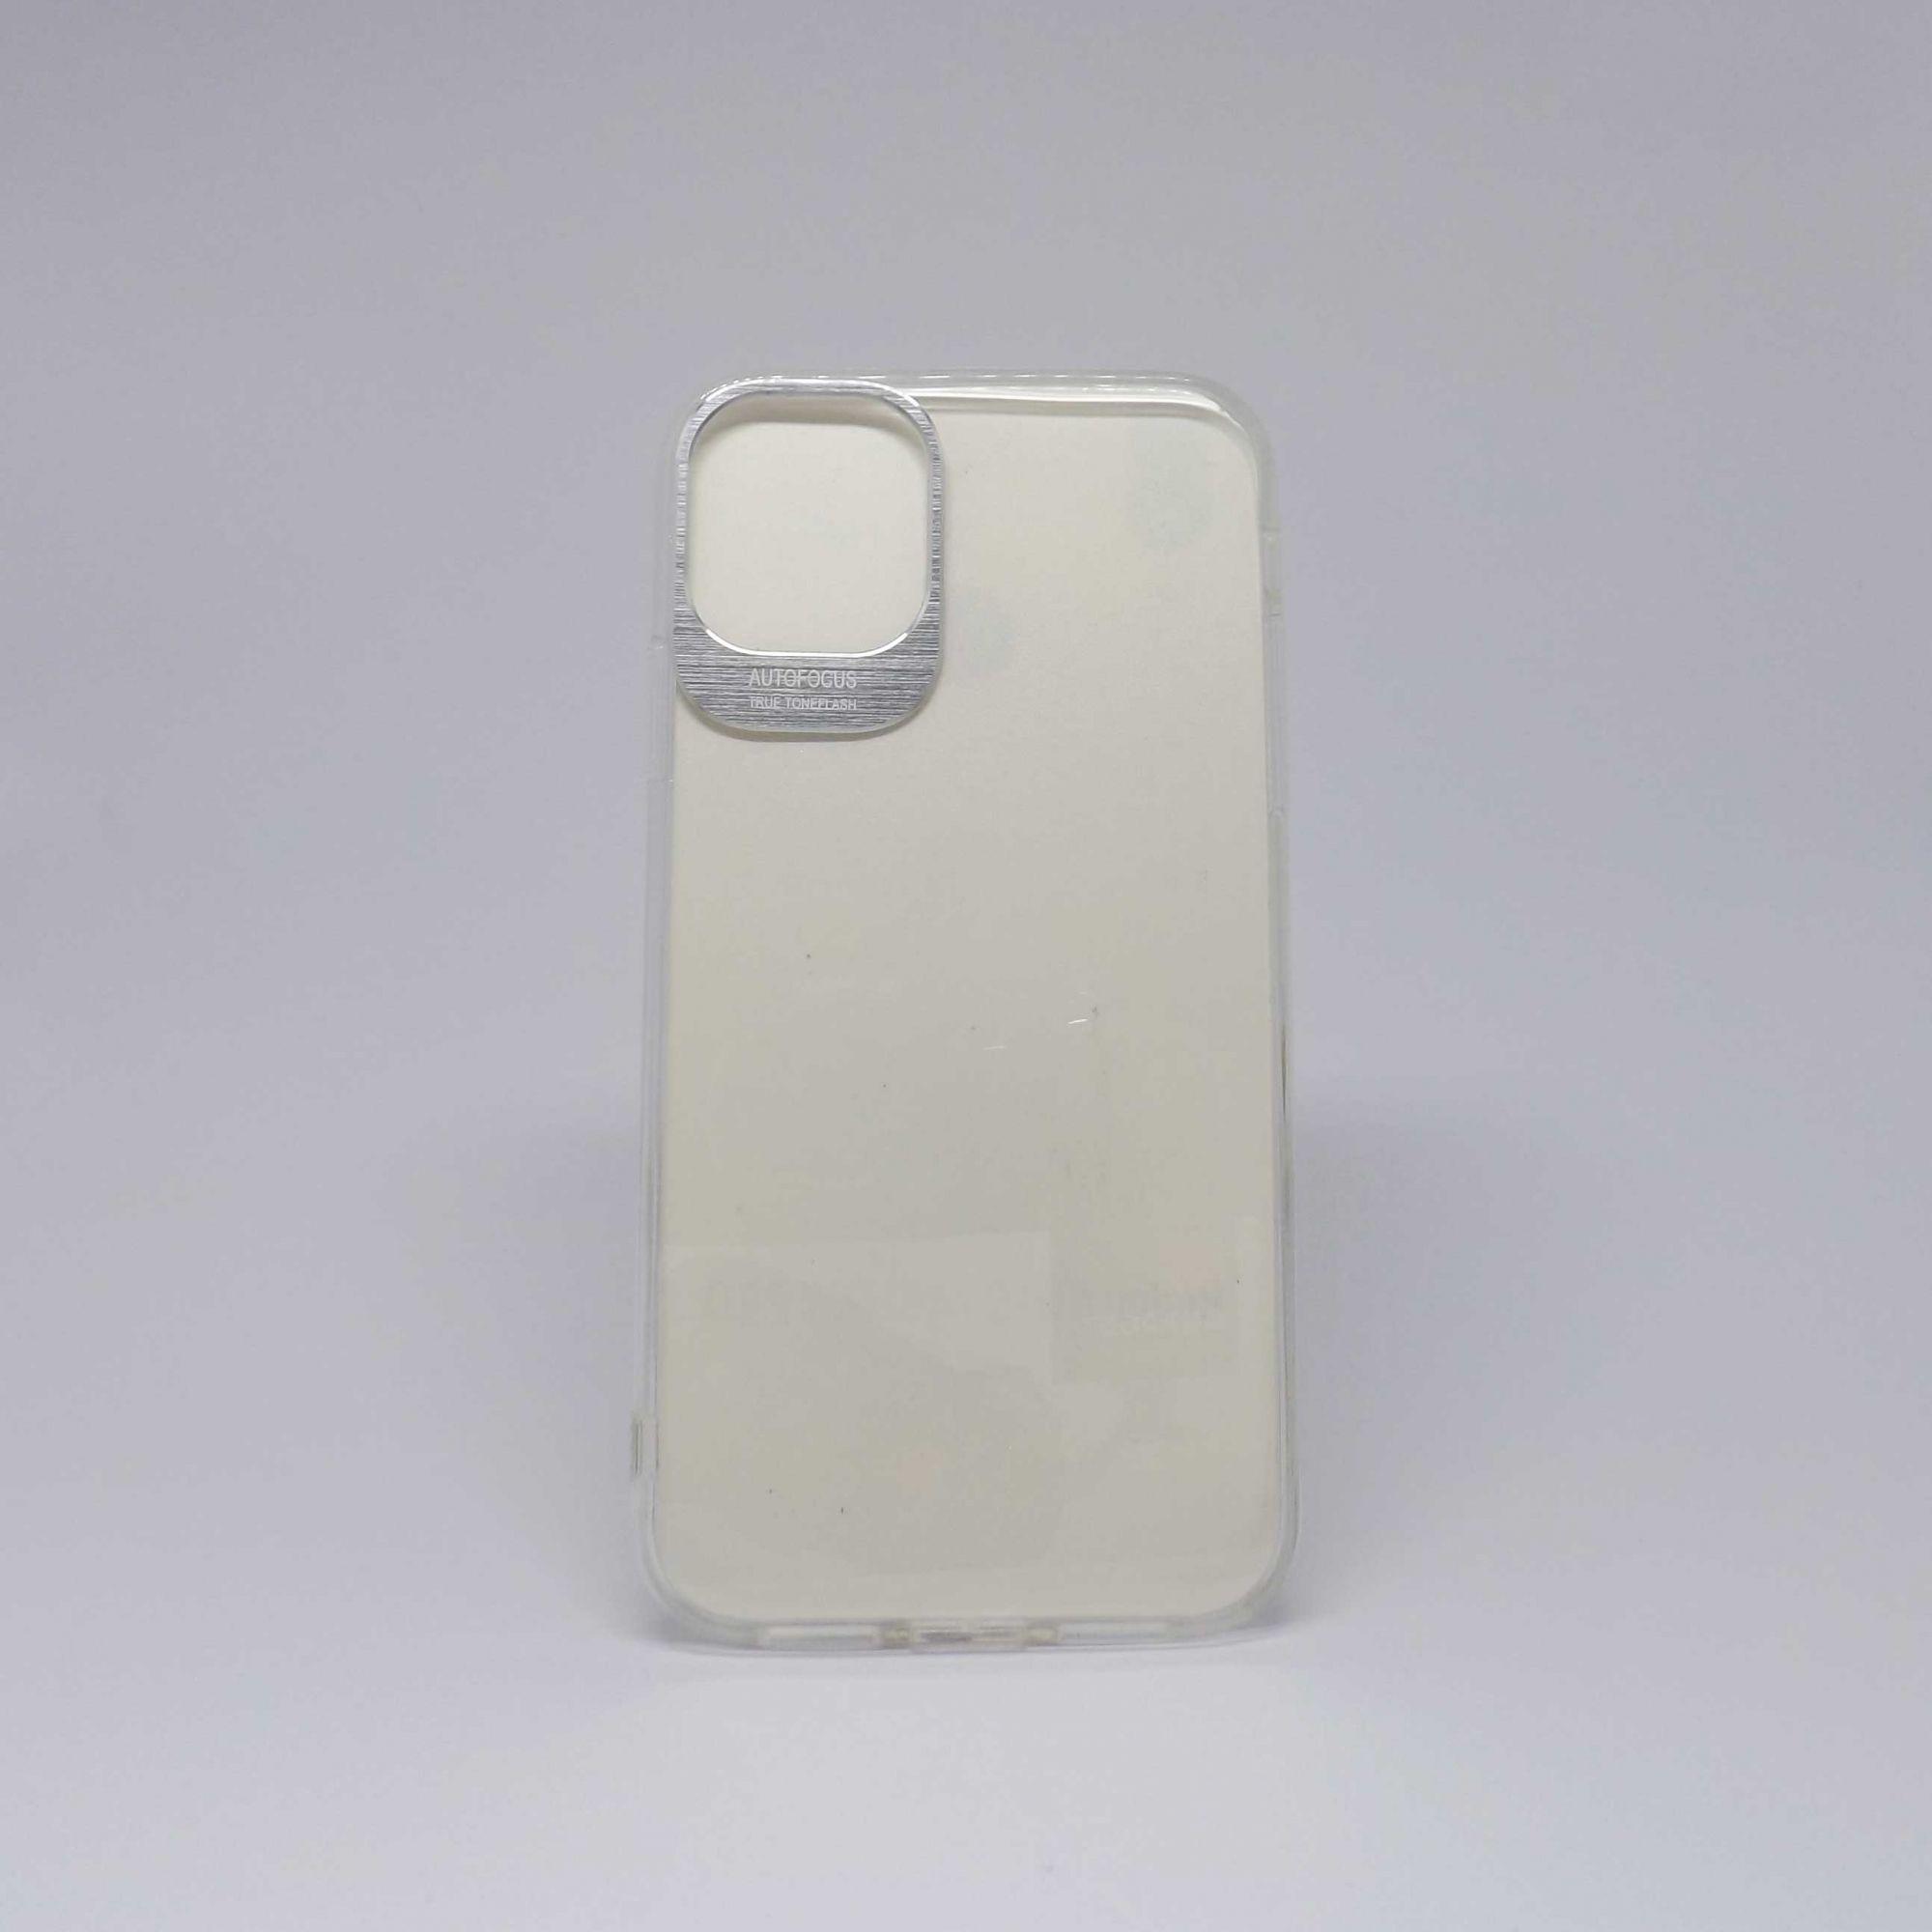 Capa Iphone 11 Antiqueda Transparente Com Borda Colorida